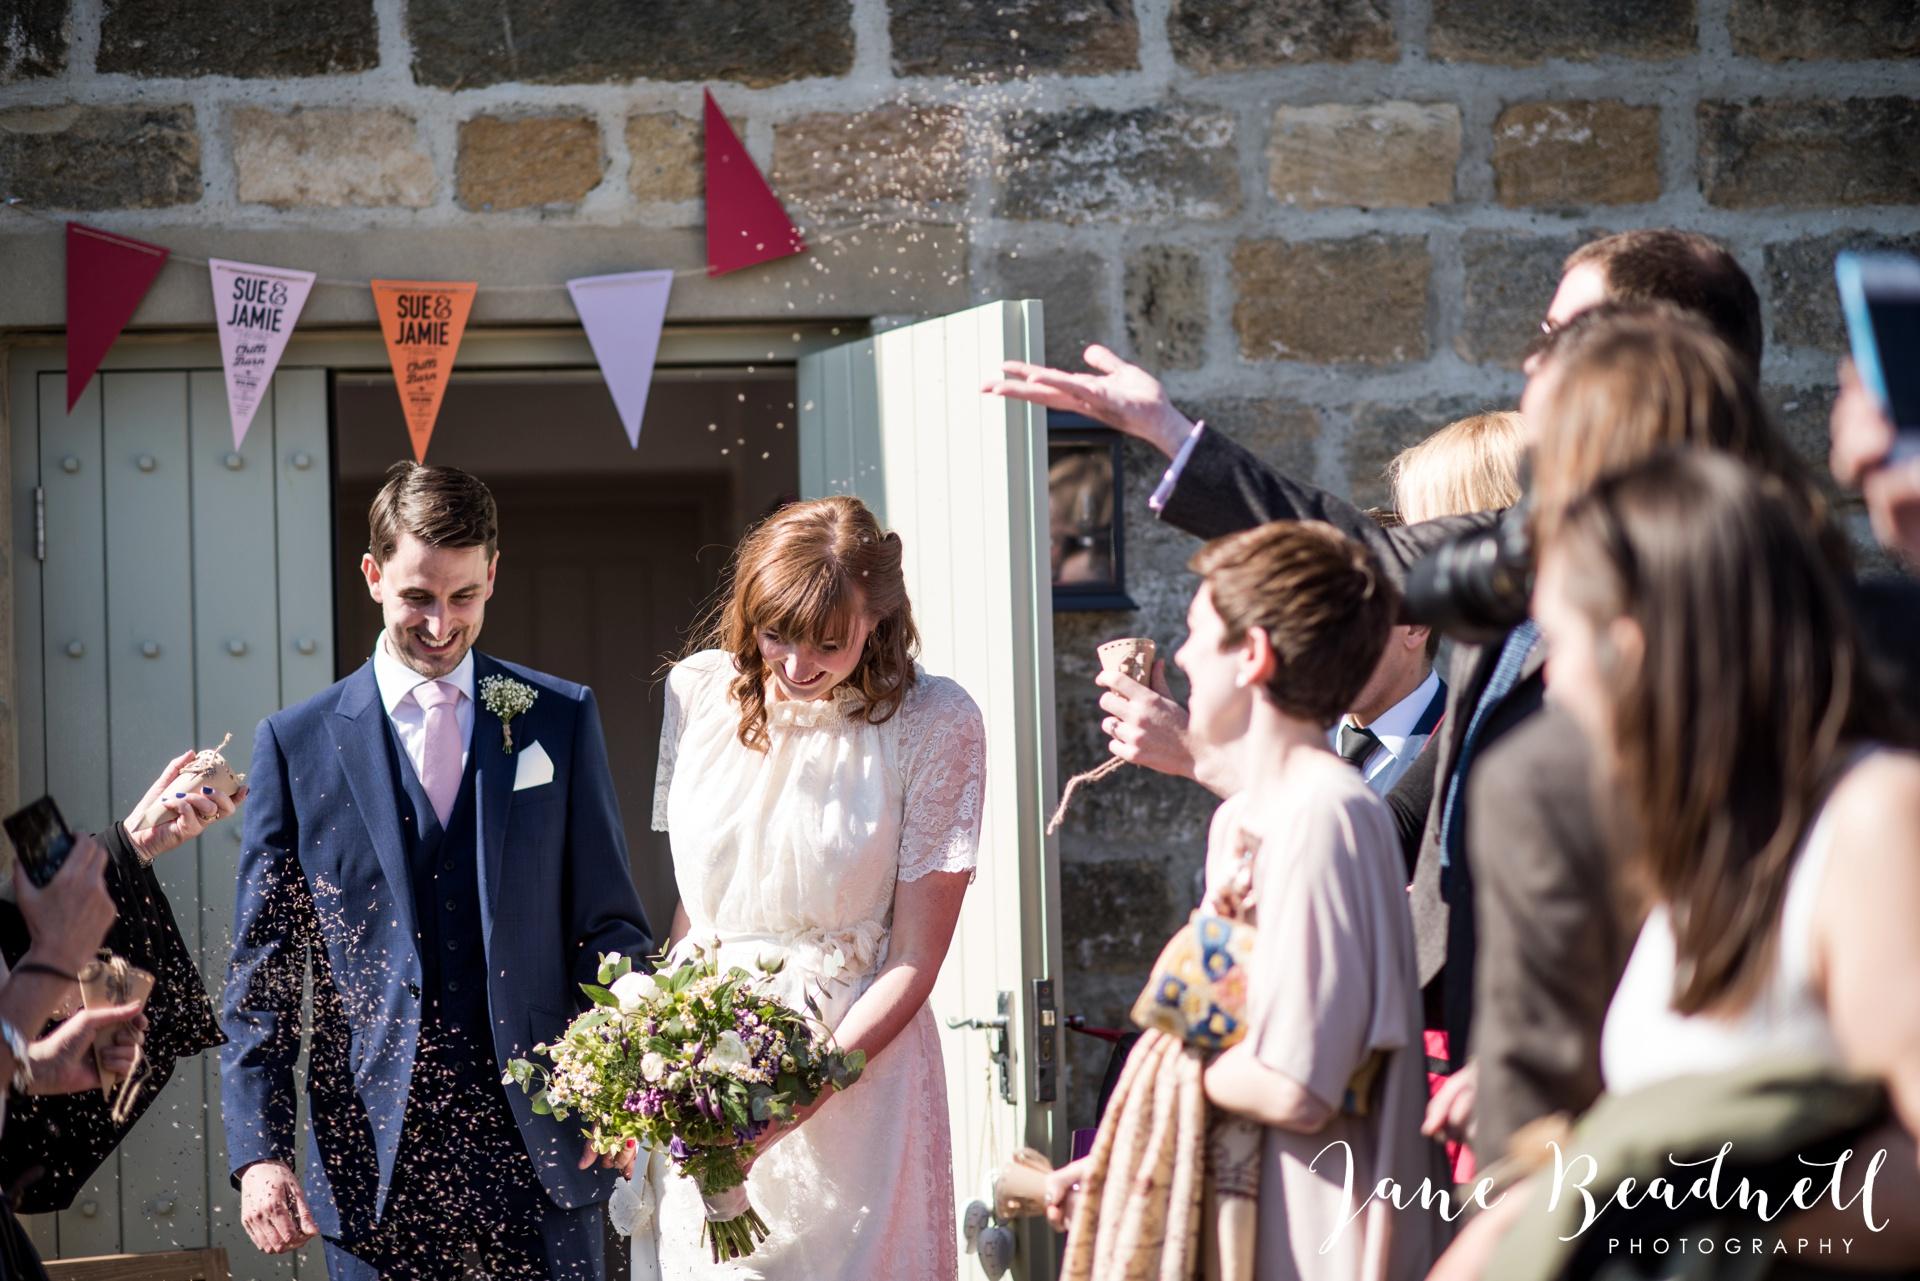 Jane Beadnell fine art wedding photographer The Cheerful Chilli Barn Otley_0025